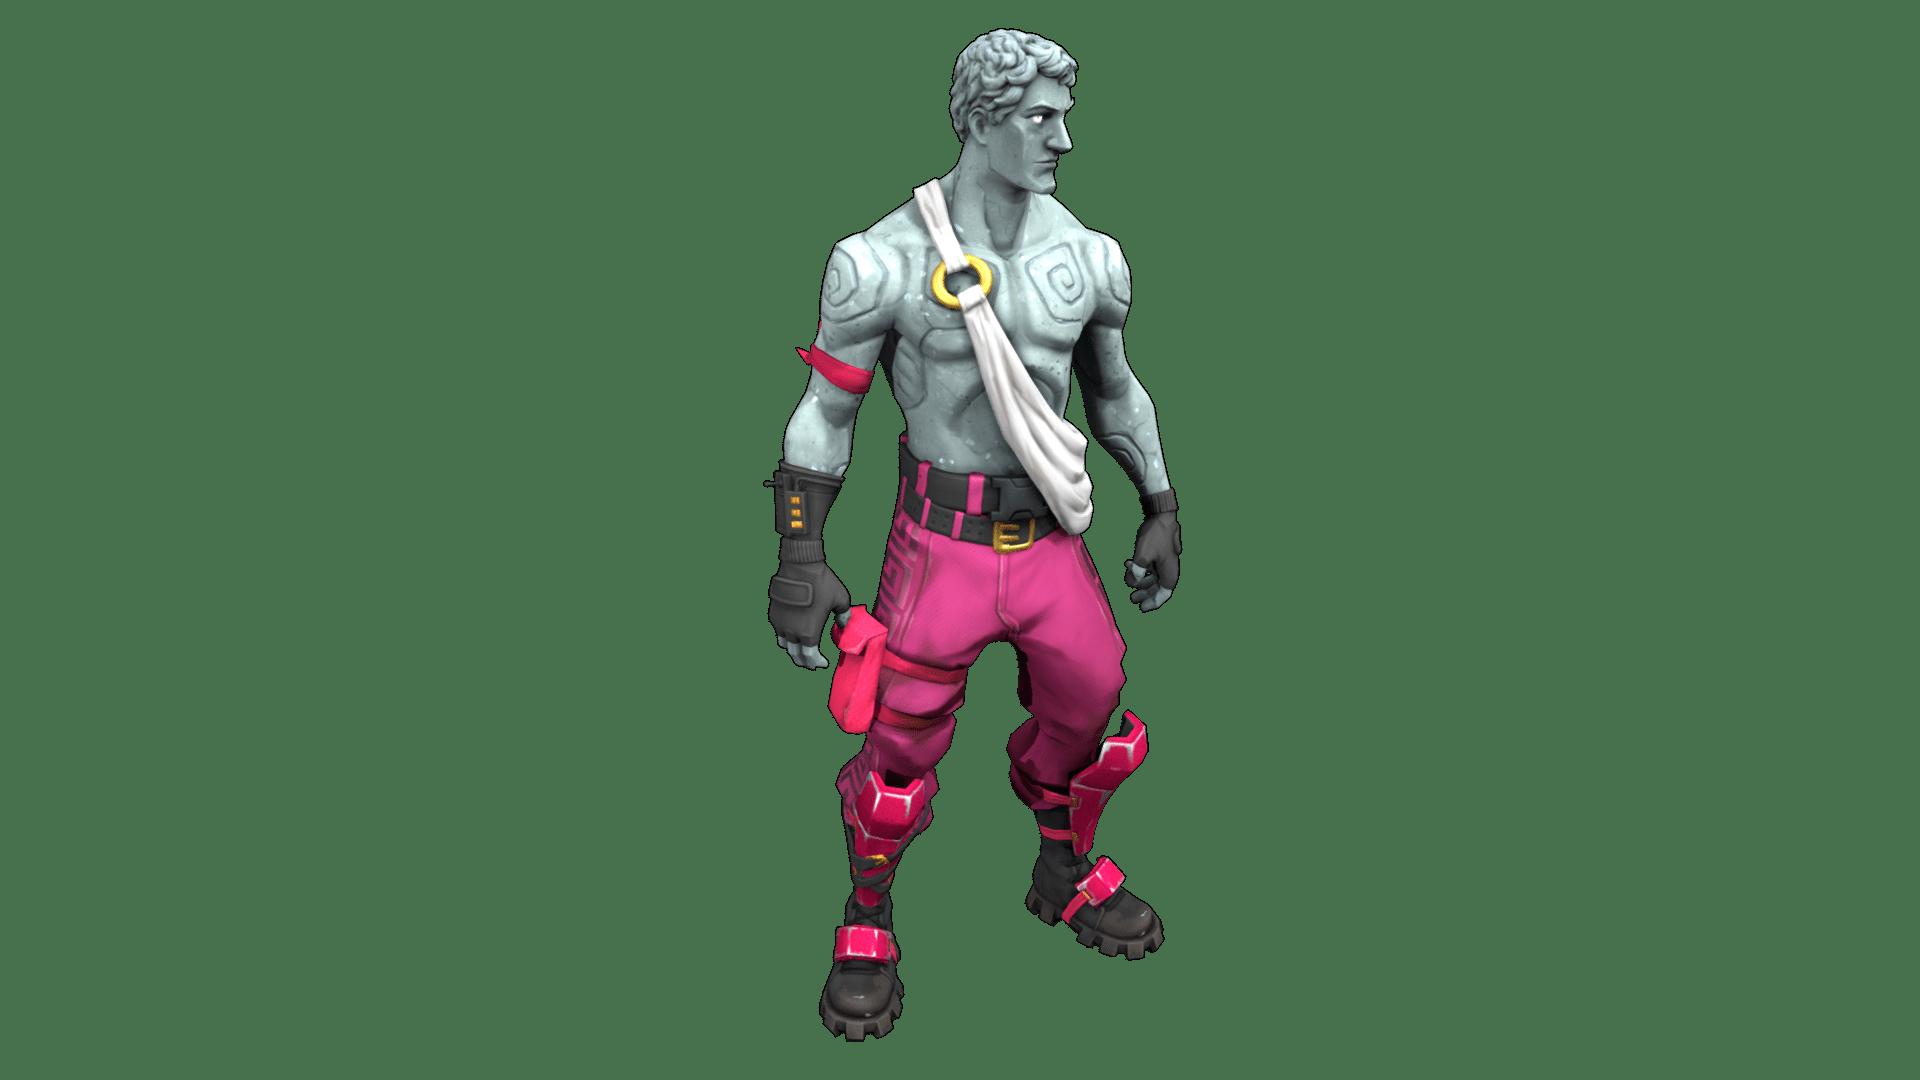 Fortnite Love Ranger Outfits   Fortnite Skins 1920x1080